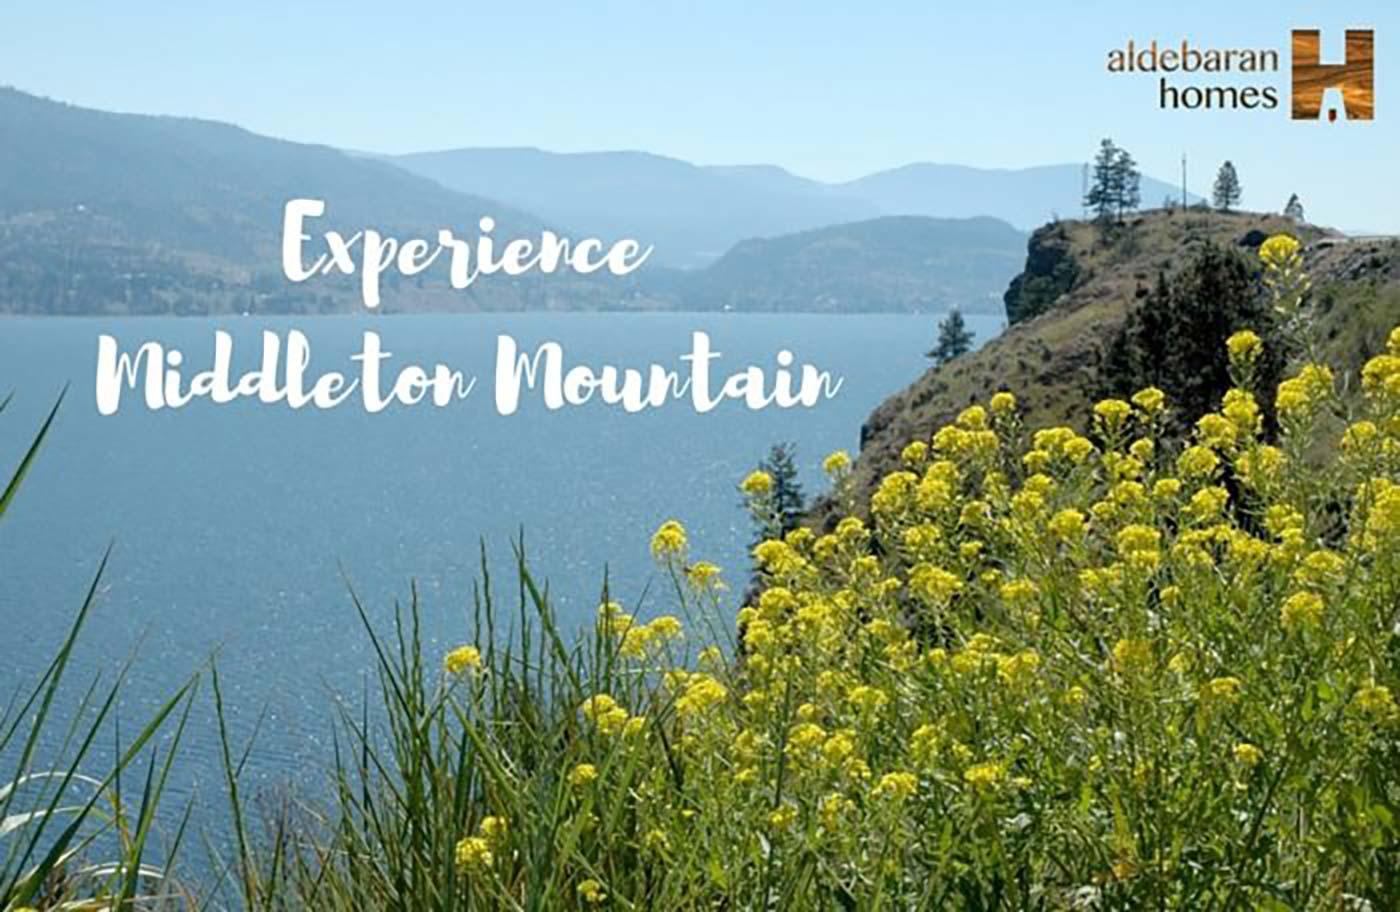 Lake Kalamalka With The Text 'Experience Middleton Mountain'